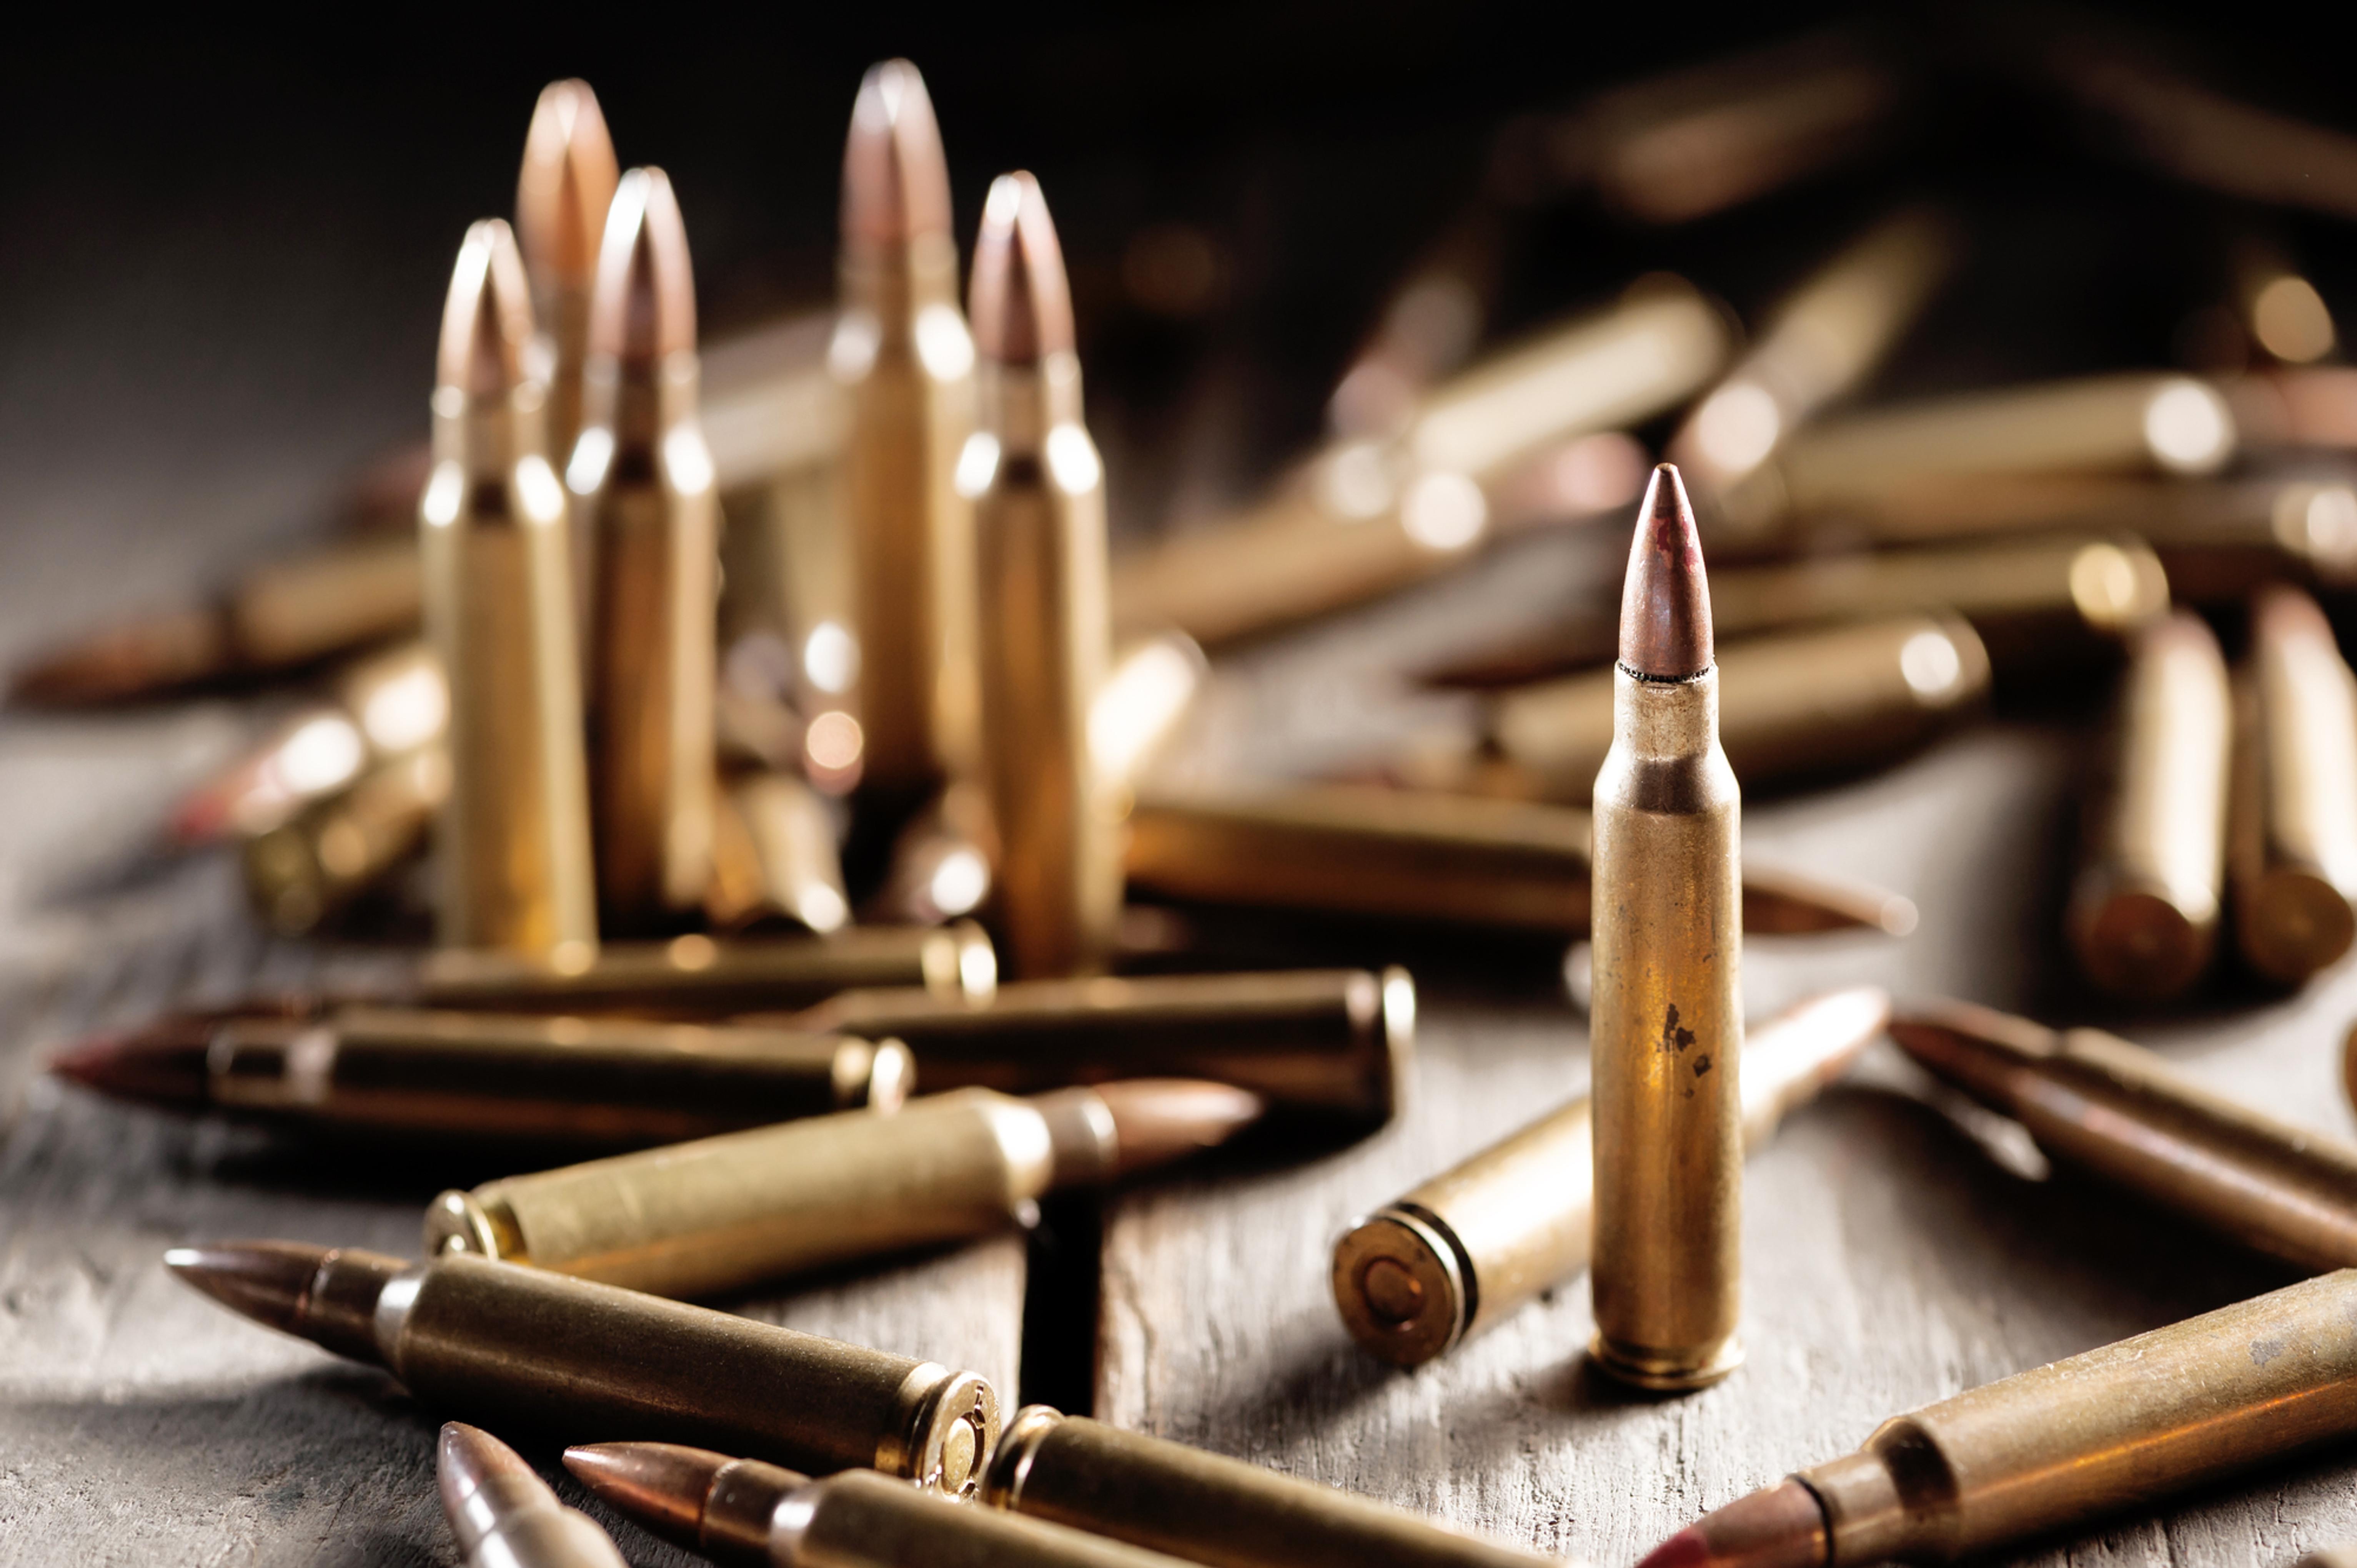 Home Defense & Firearm Safety